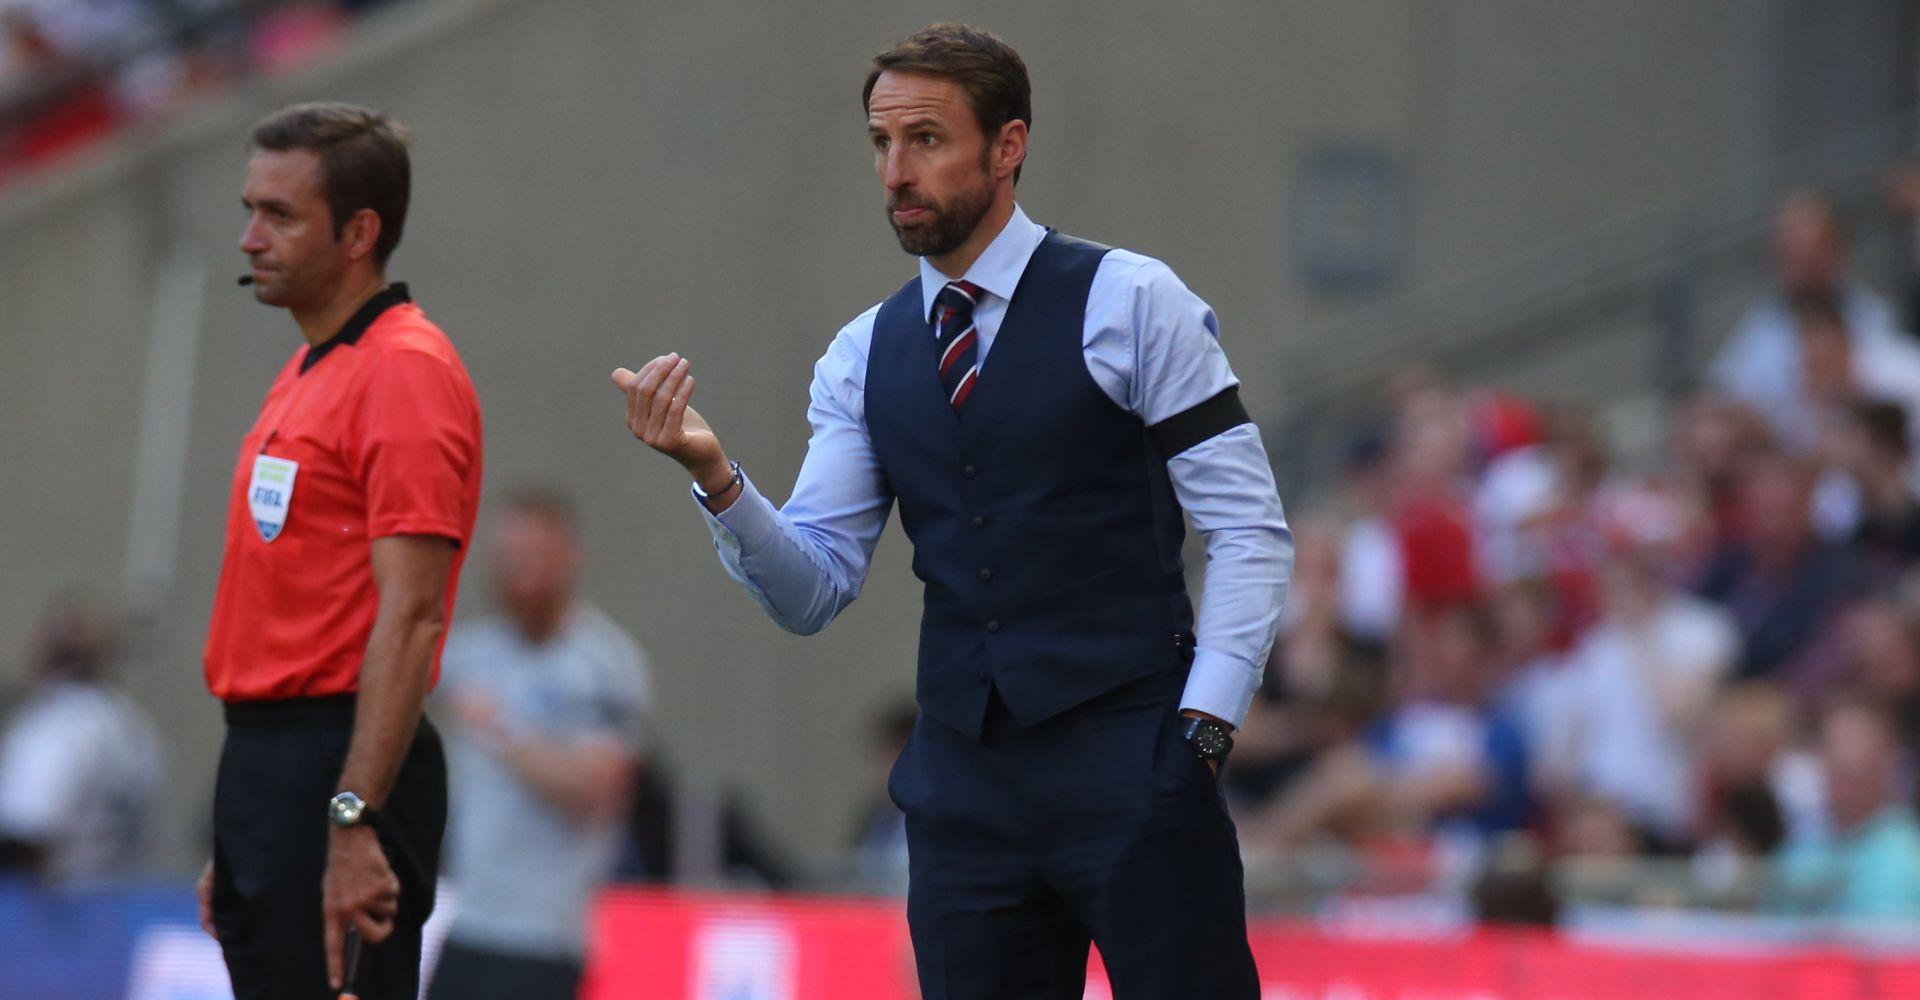 Marcus Rashford gave Gareth Southgate reason to ponder with his performance against Costa Rica